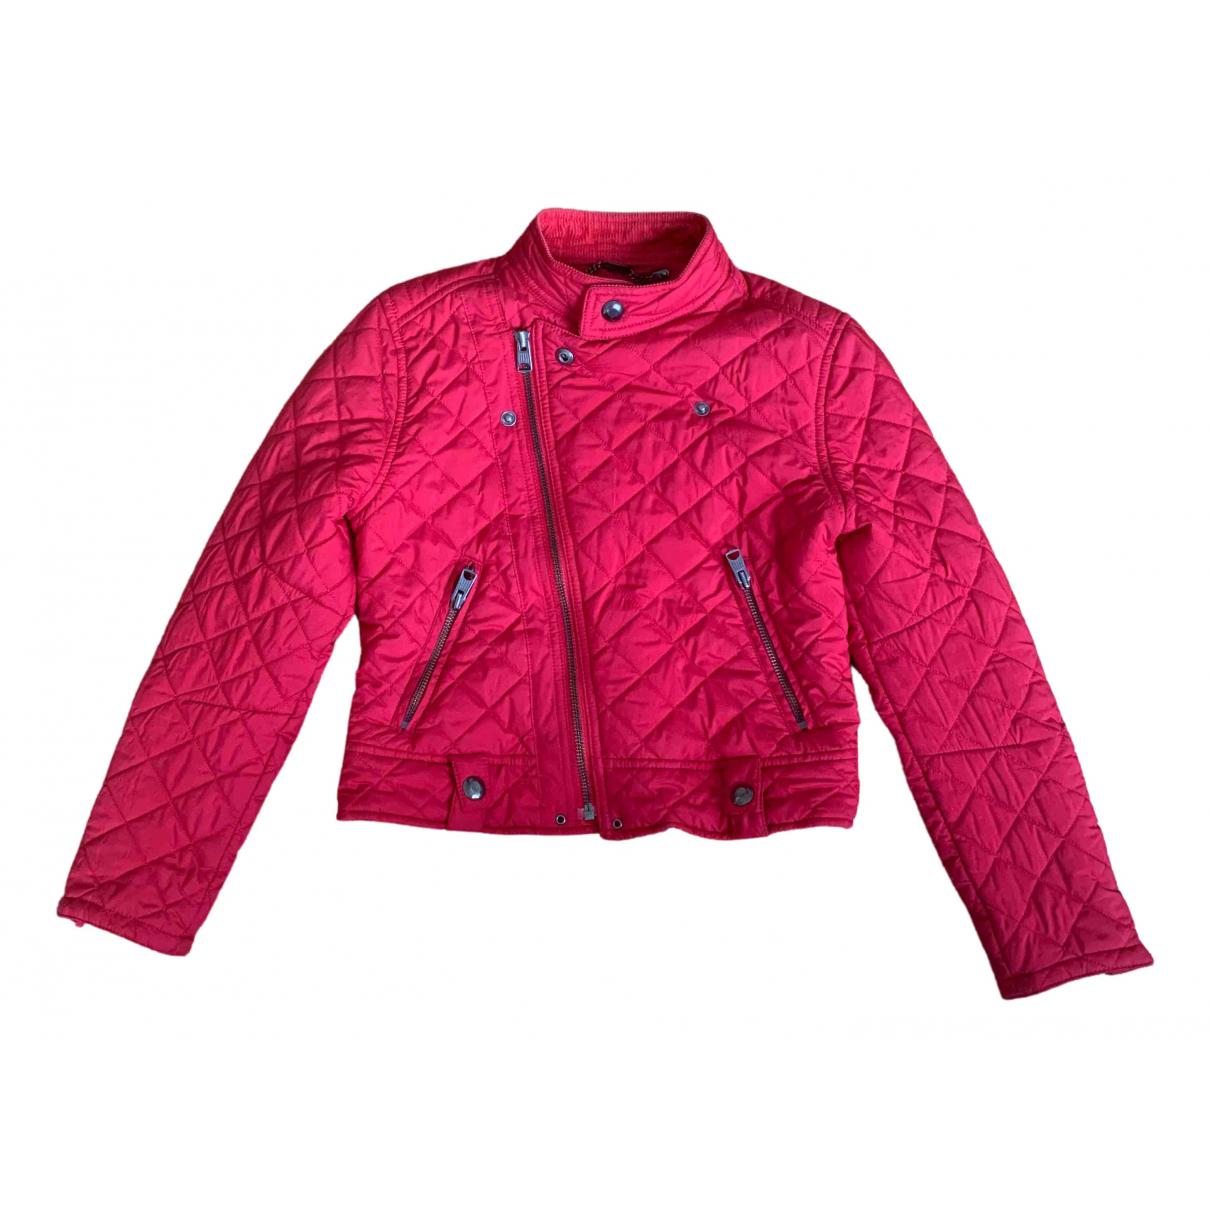 Ralph Lauren \N Pink jacket & coat for Kids 10 years - until 56 inches UK